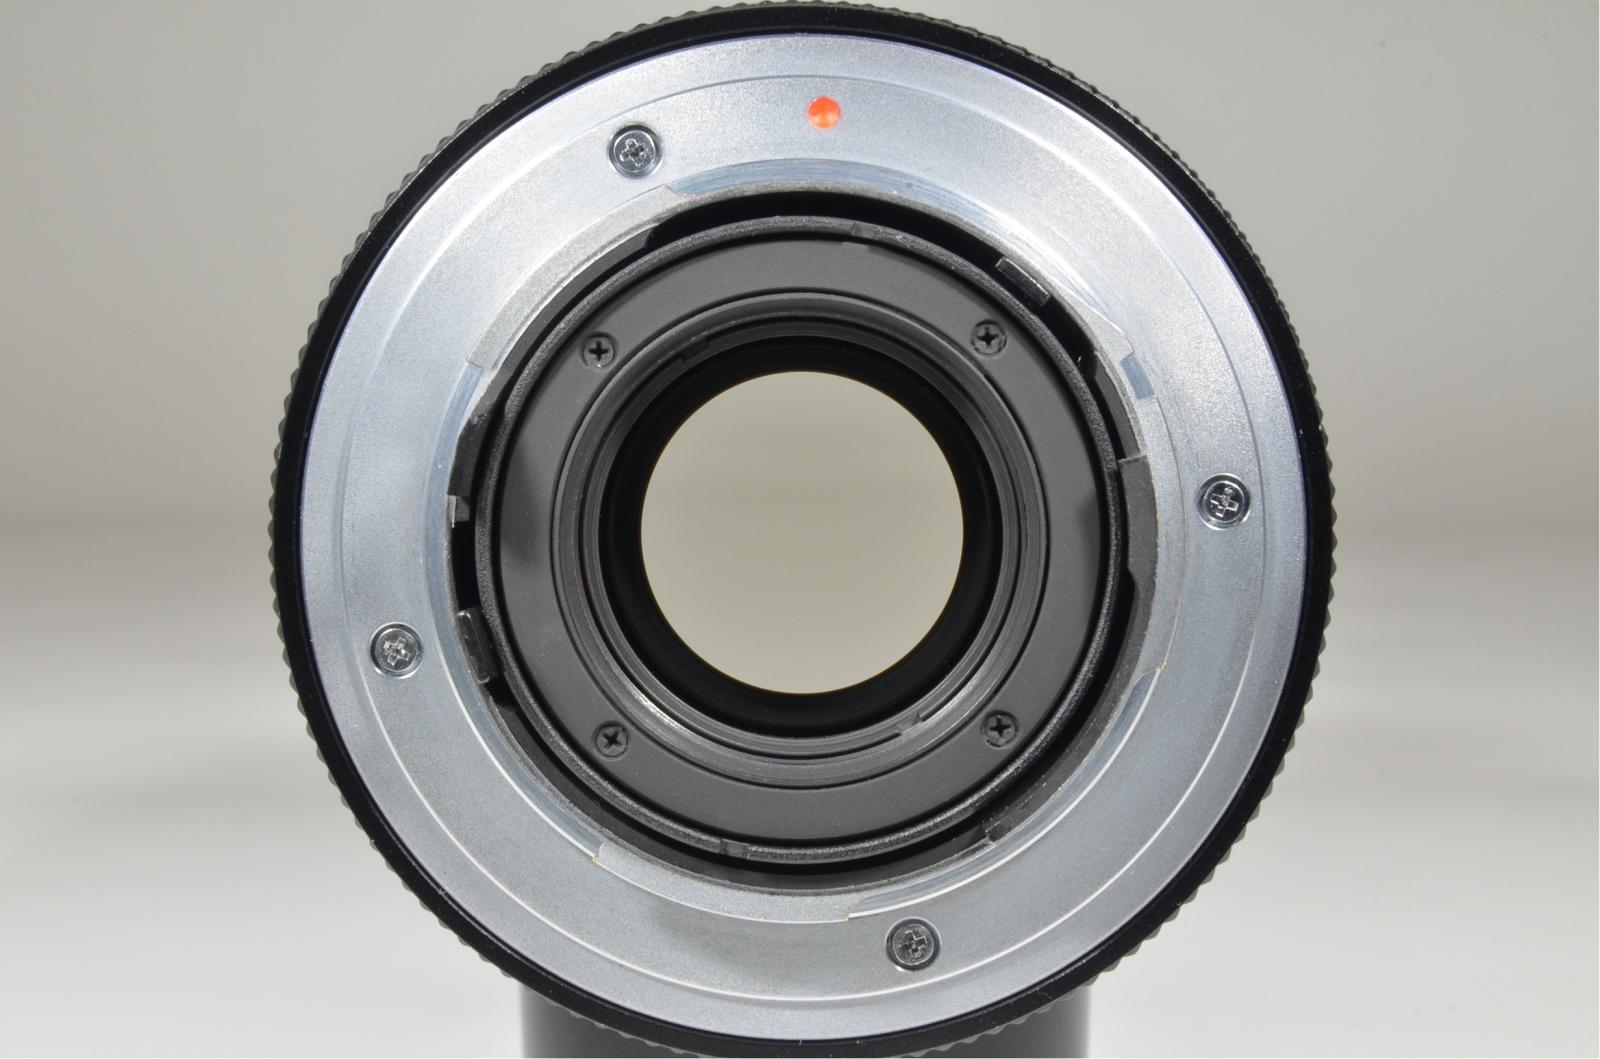 contax carl zeiss makro-planar t* 100mm f2.8 aeg